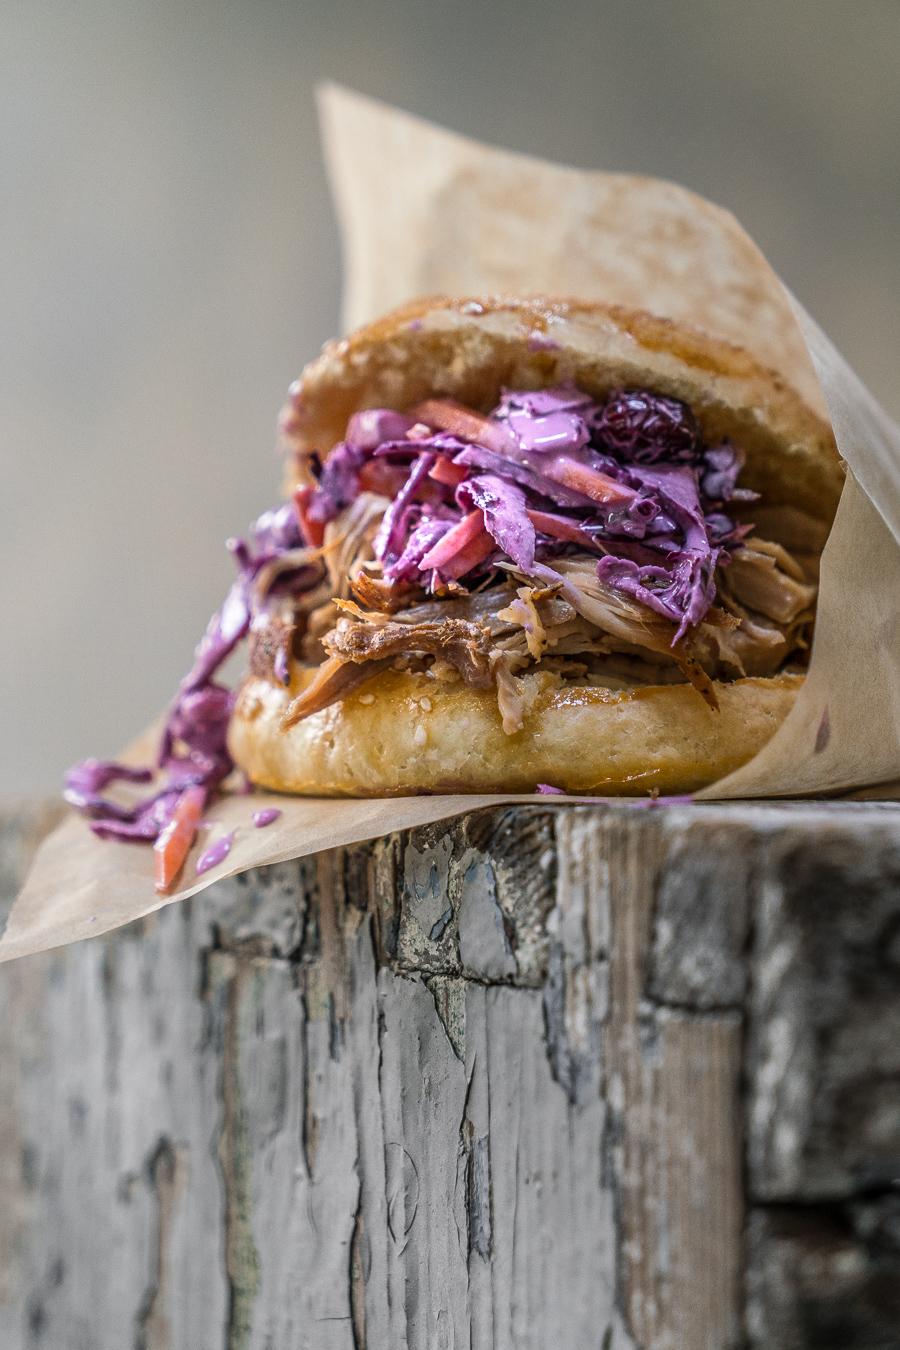 Pulled Pork Burger with Coleslaw